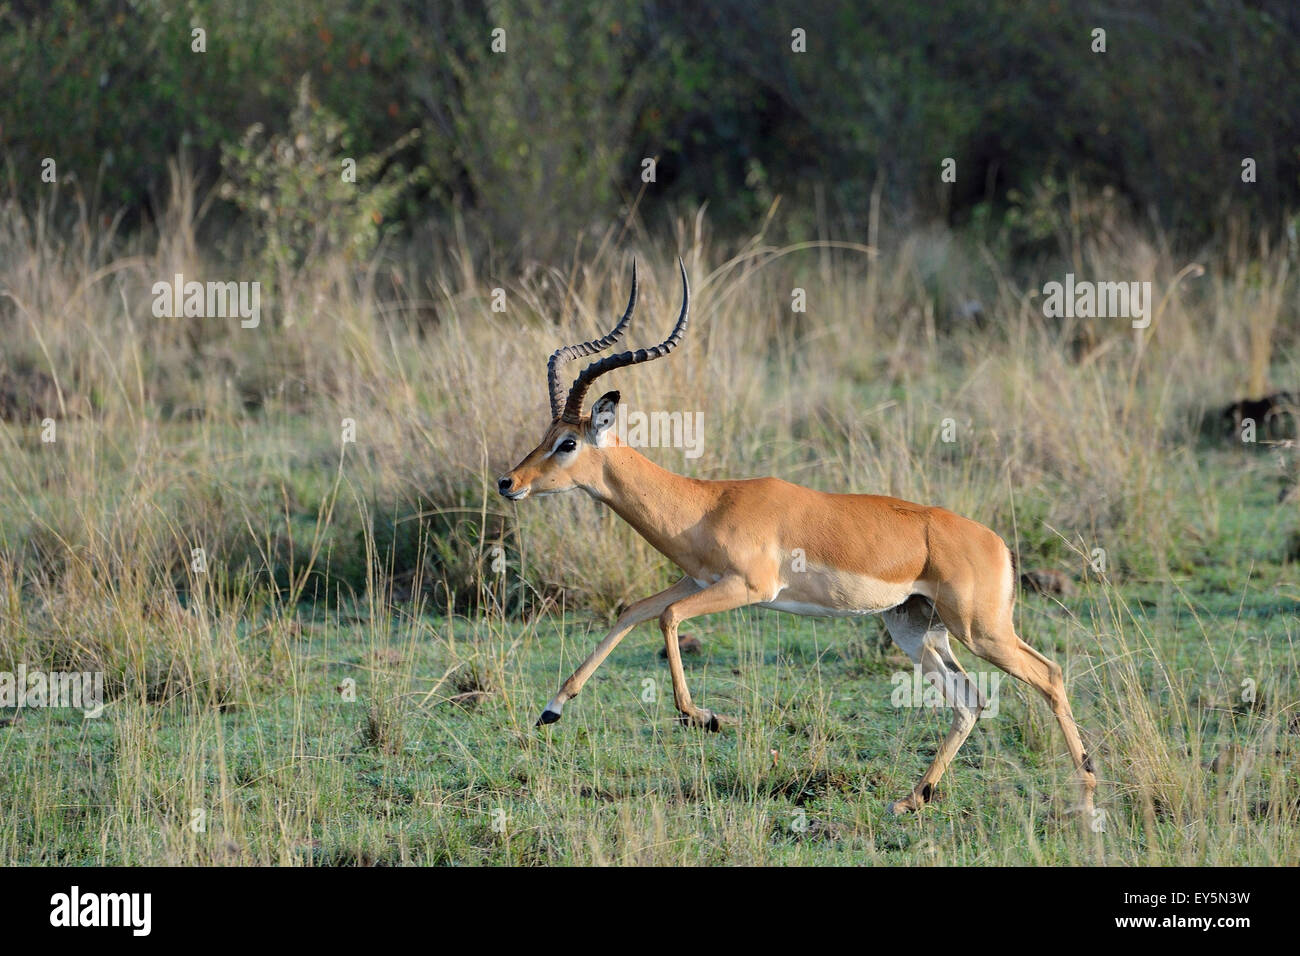 Male leaping Impala in savanna - Masai Mara Kenya - Stock Image